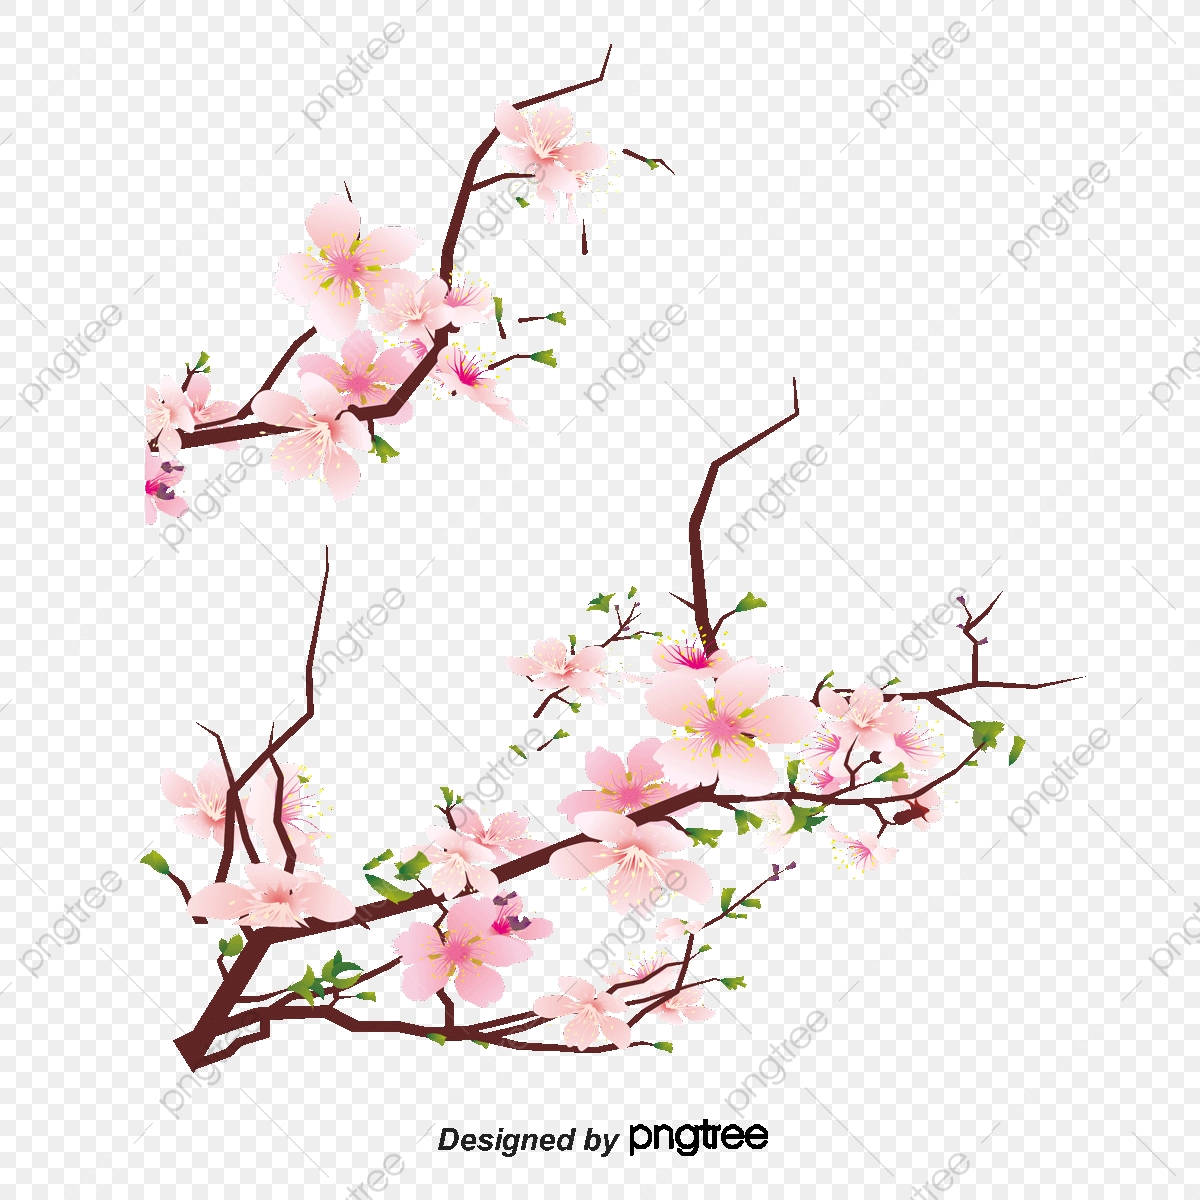 Hiasan Bunga Vektor Hiasan Bunga Bunga Png Dan Vektor Untuk Muat